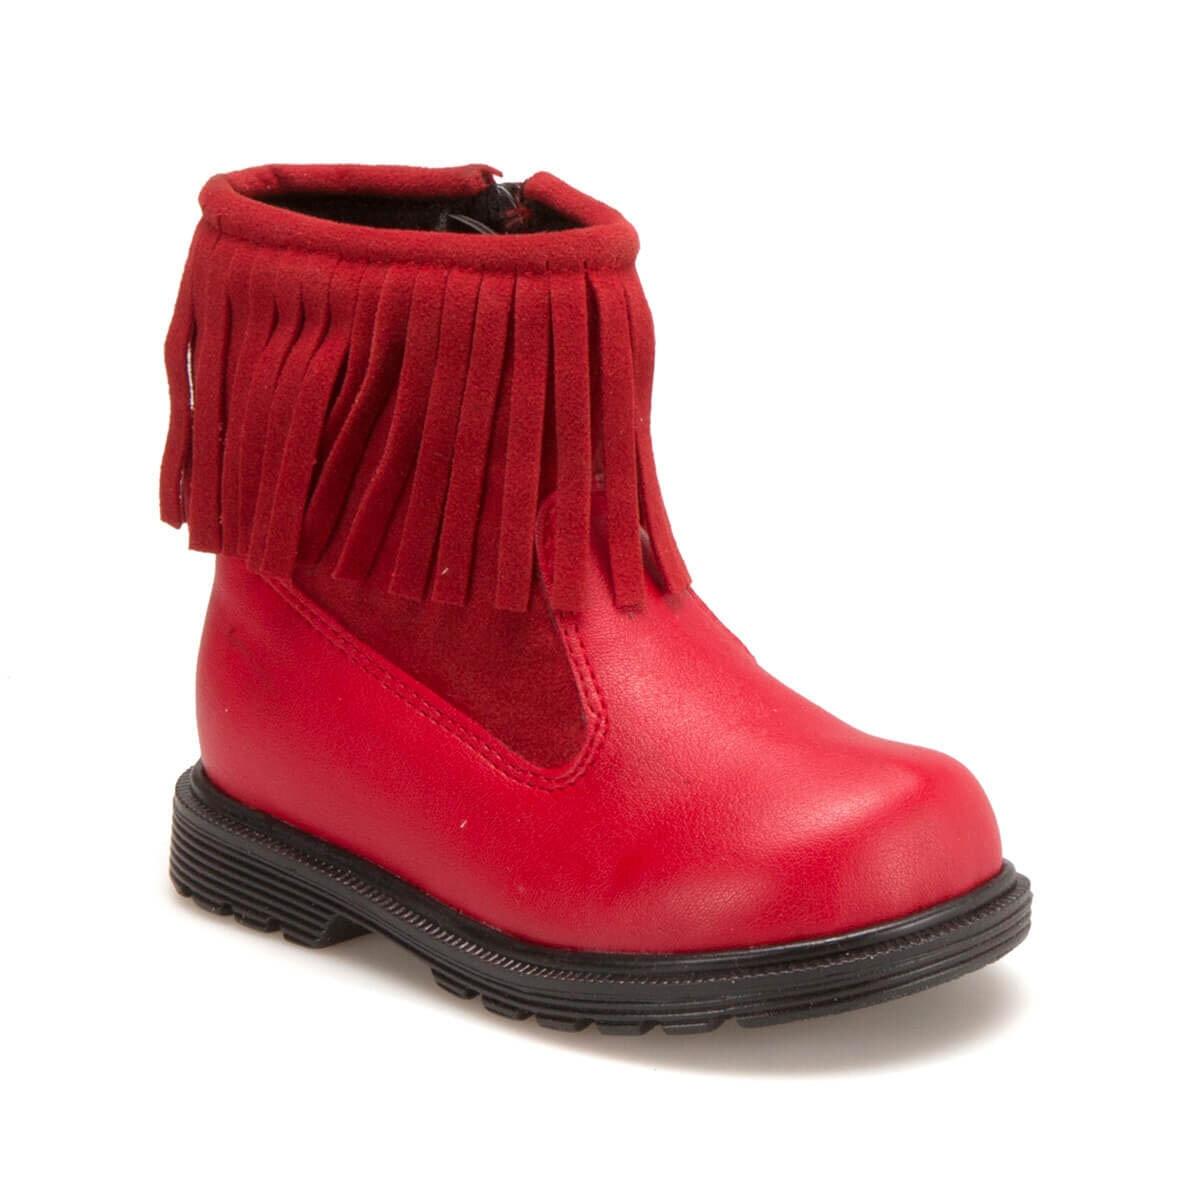 FLO 62.508412.B Red Female Child Boots Polaris